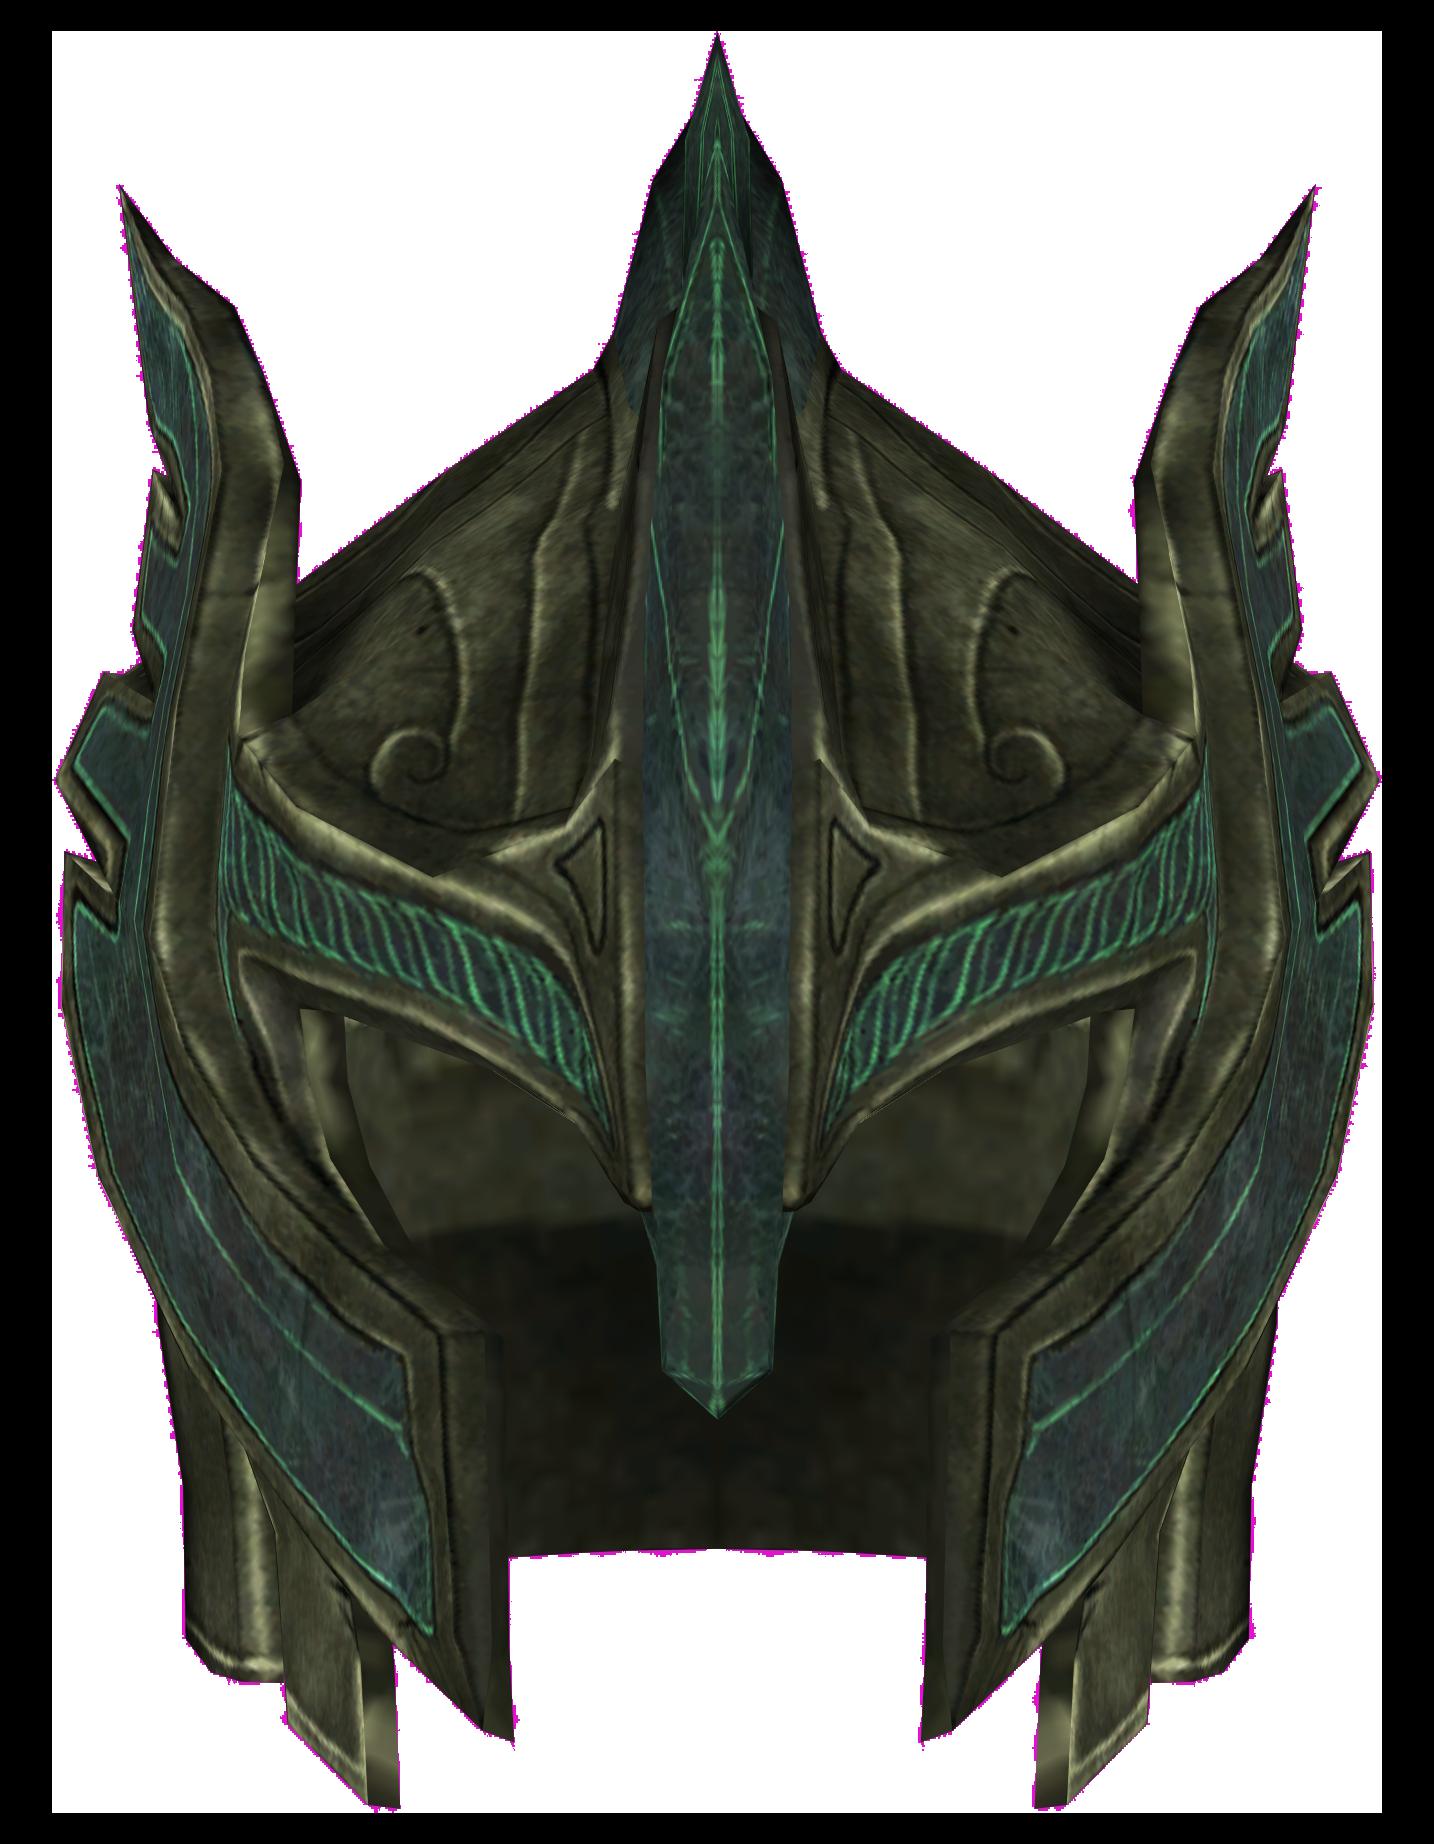 Image glass skyrim elder. Dragonborn helmet png